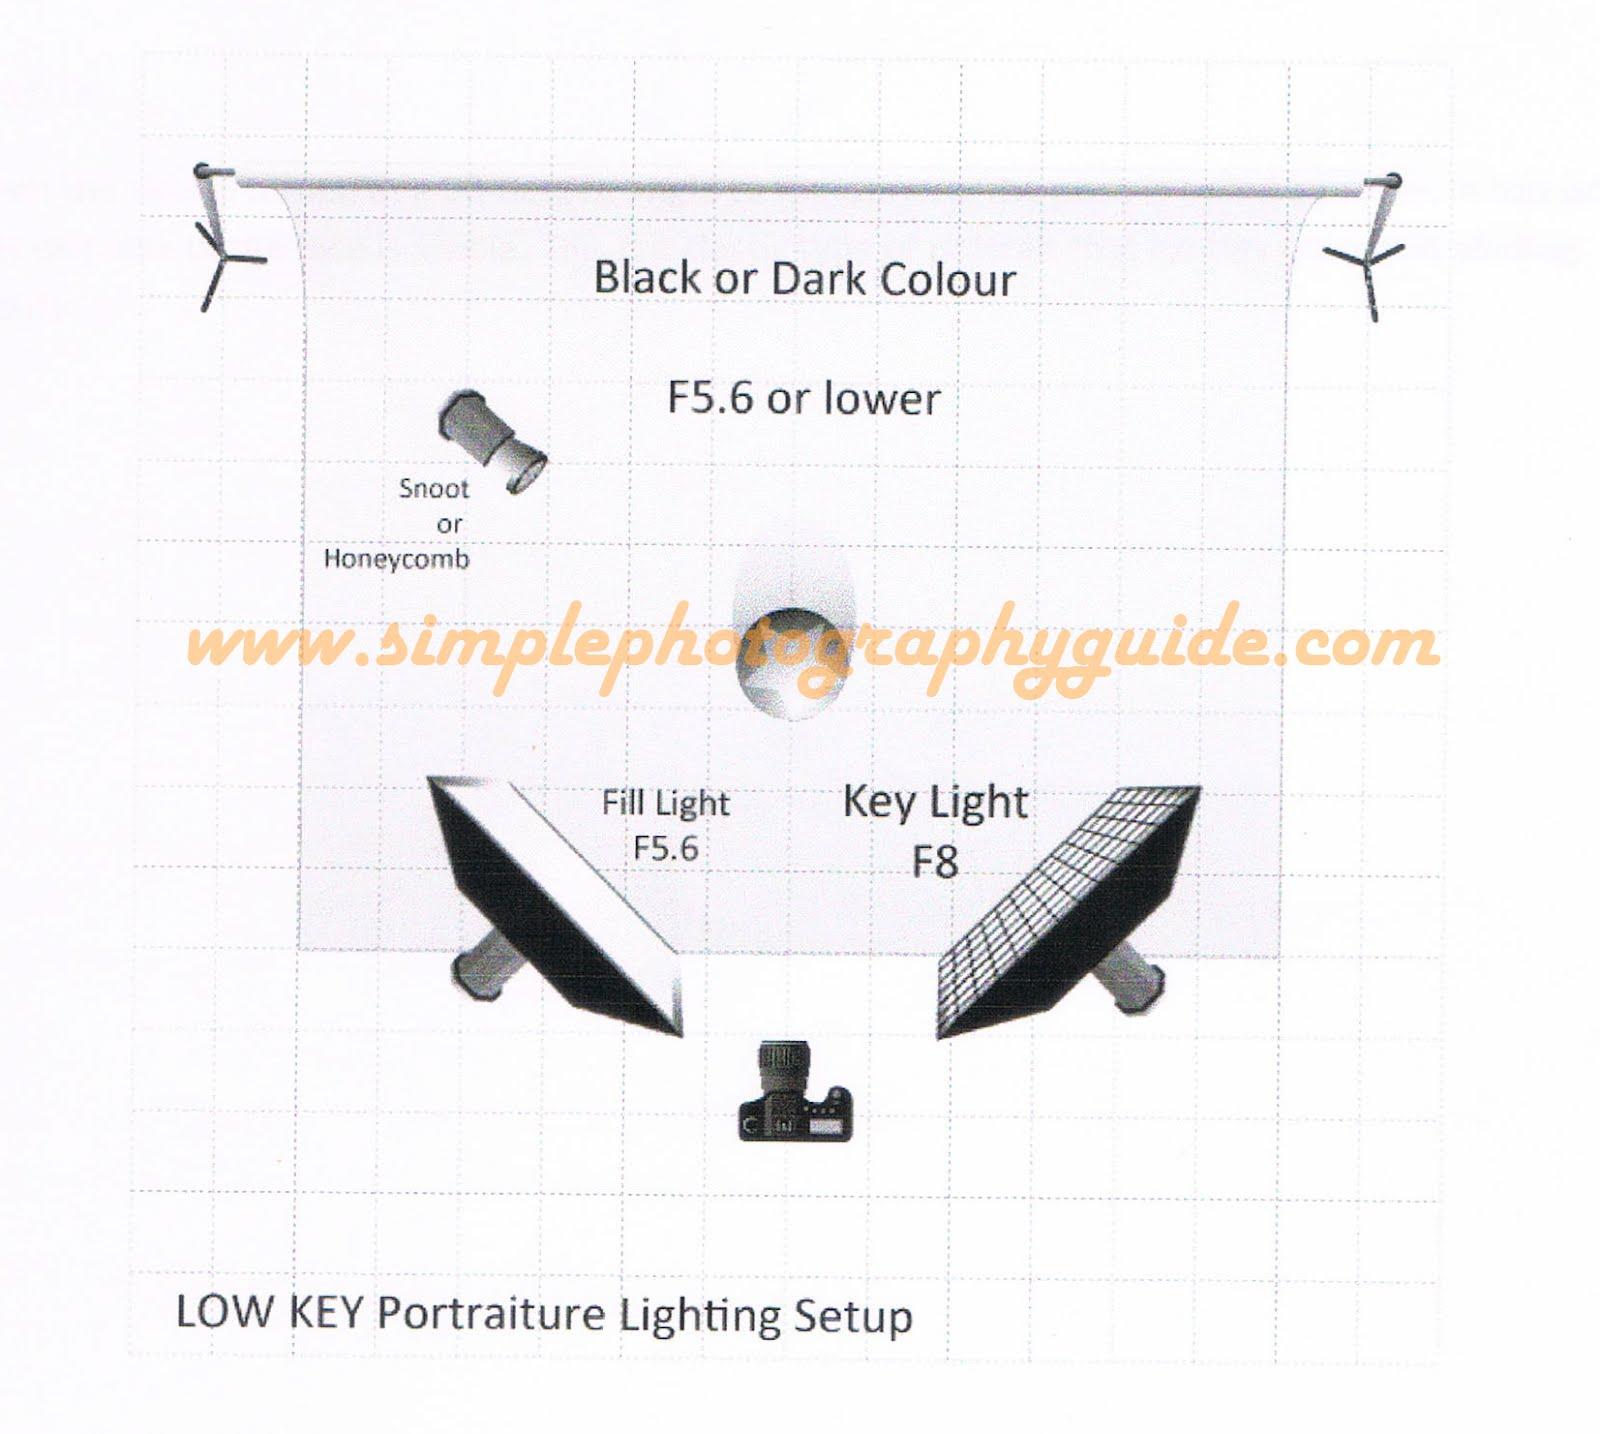 High Key u0026 Low Key  sc 1 st  Simple Photography Guide & Simple Photography Guide: High Key u0026 Low Key